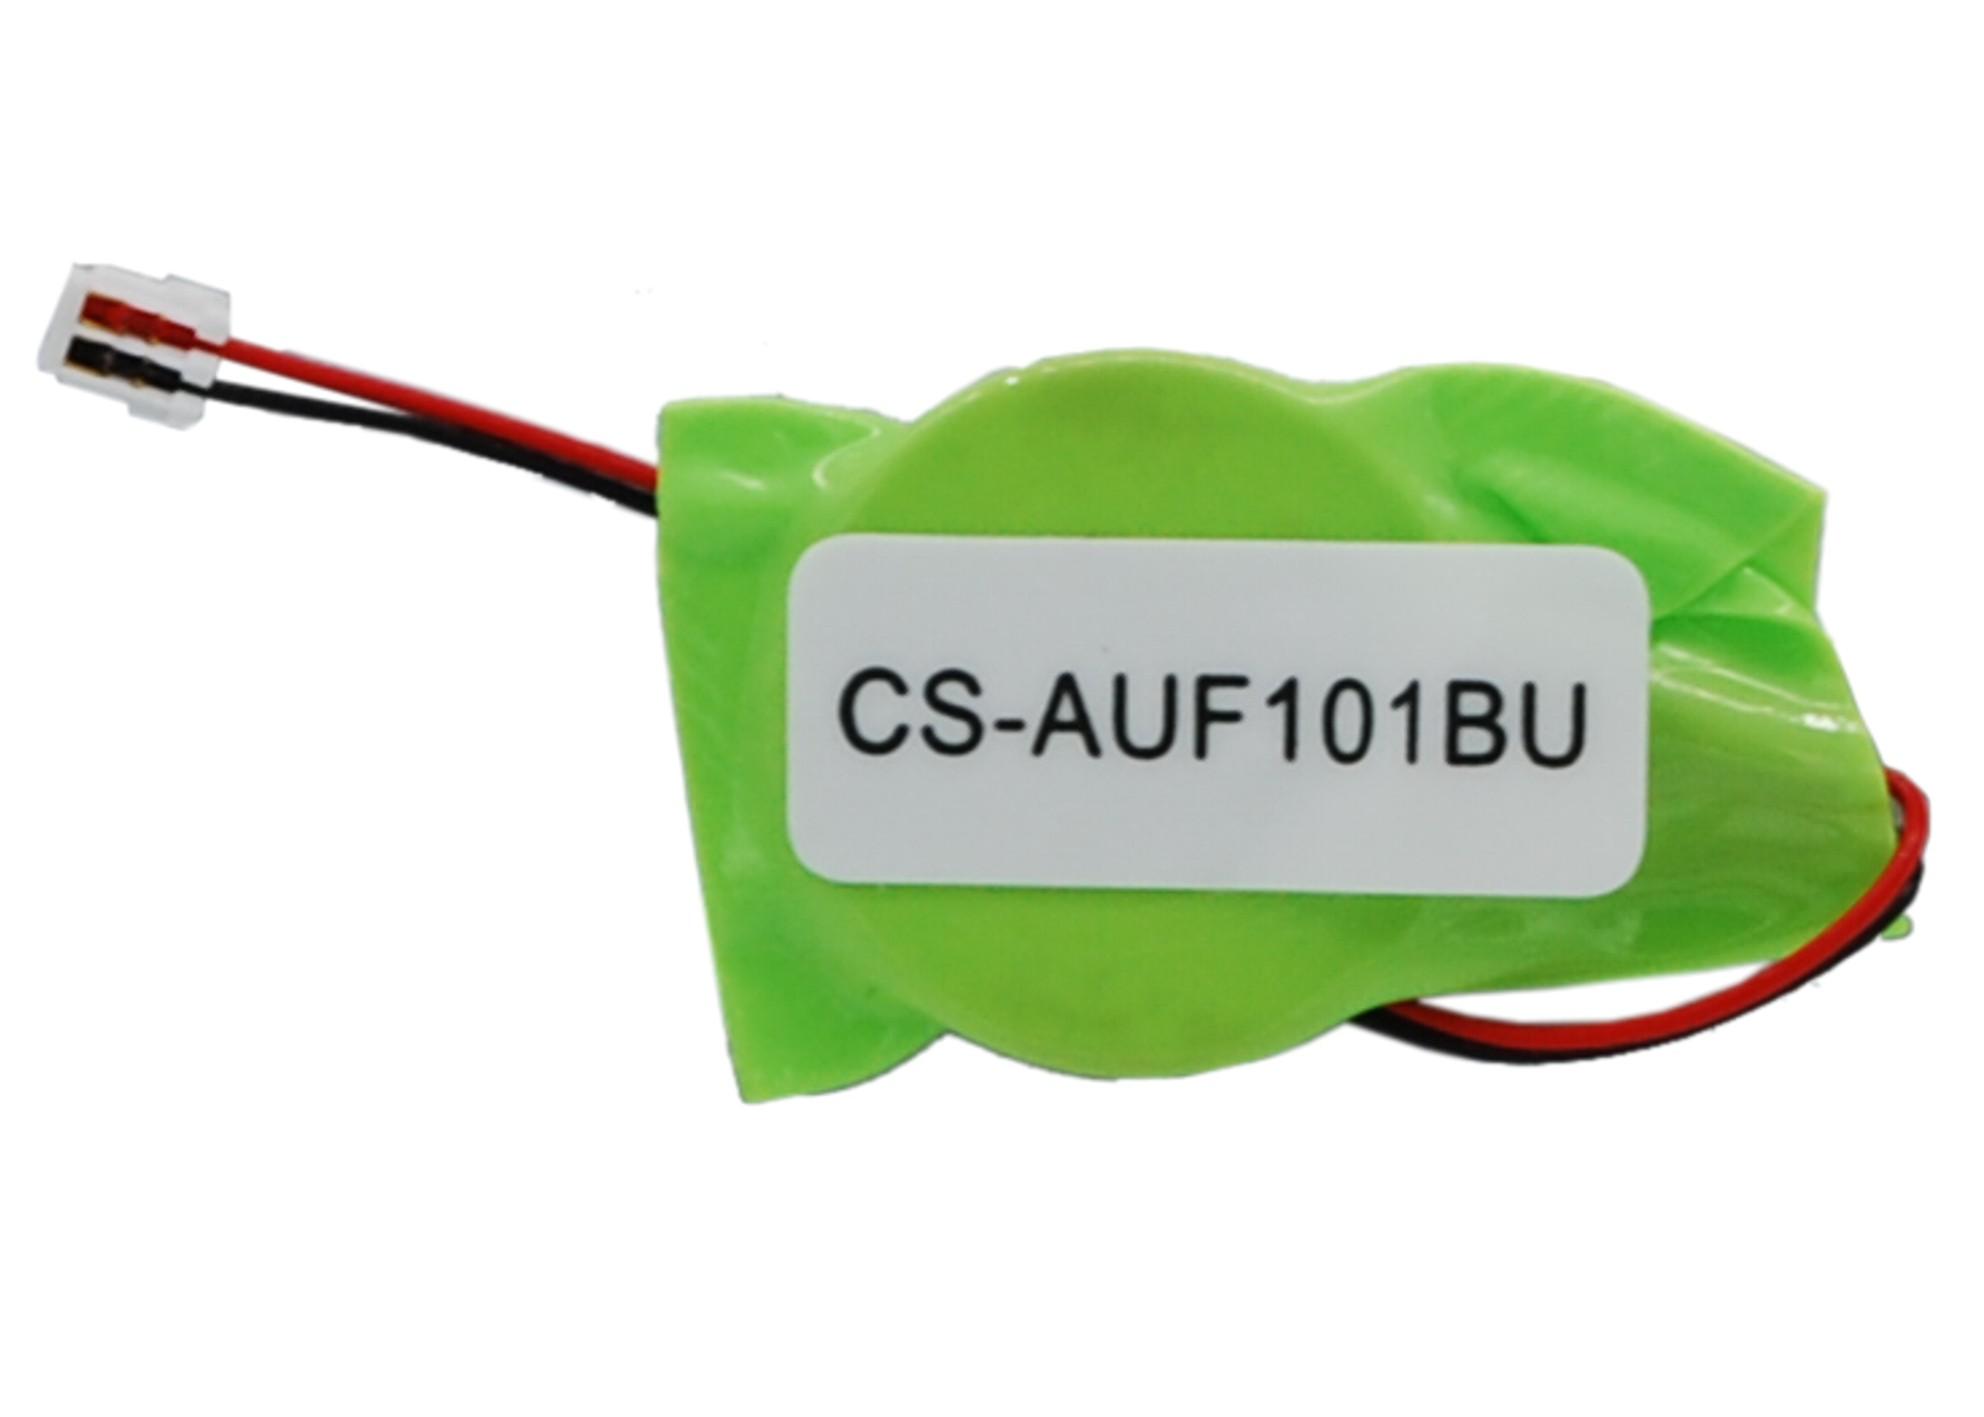 Cameron Sino baterie cmos pro ASUS Eee Pad Transformer TF101-1B221A 3V Li-ion 40mAh zelená - neoriginální